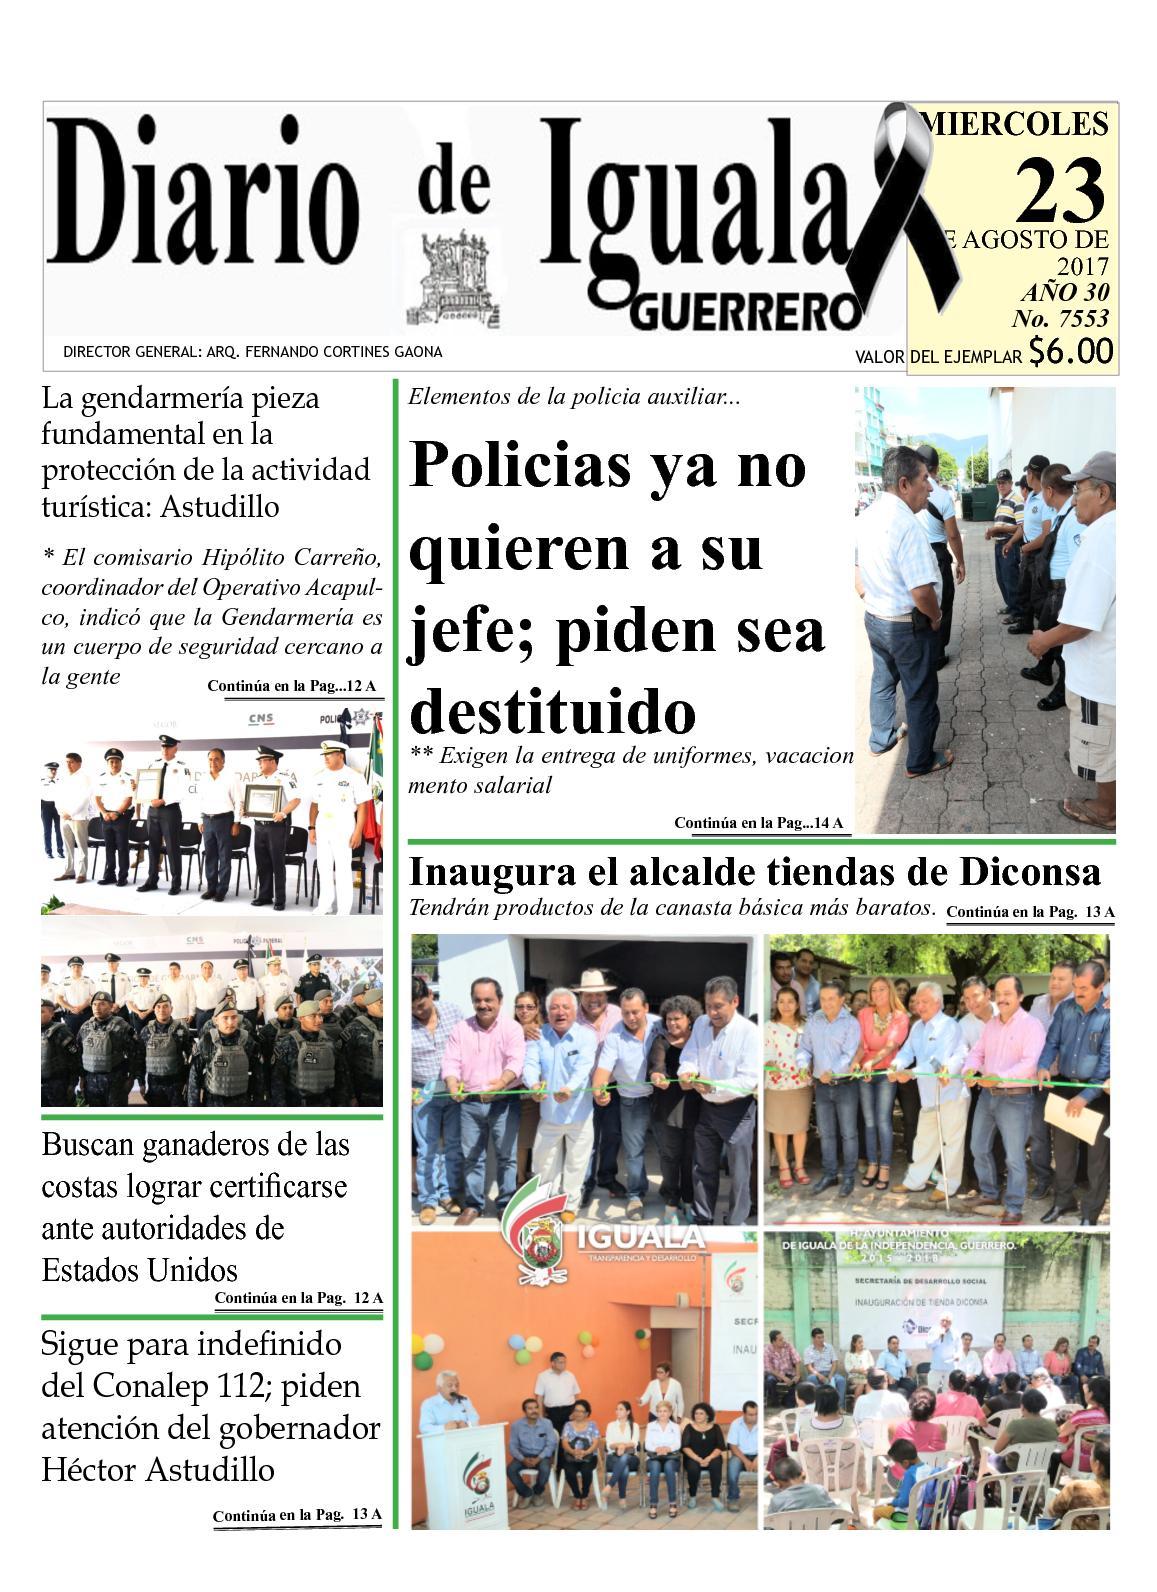 Diario De Iguala Miercoles 23 De Agosto De 2017